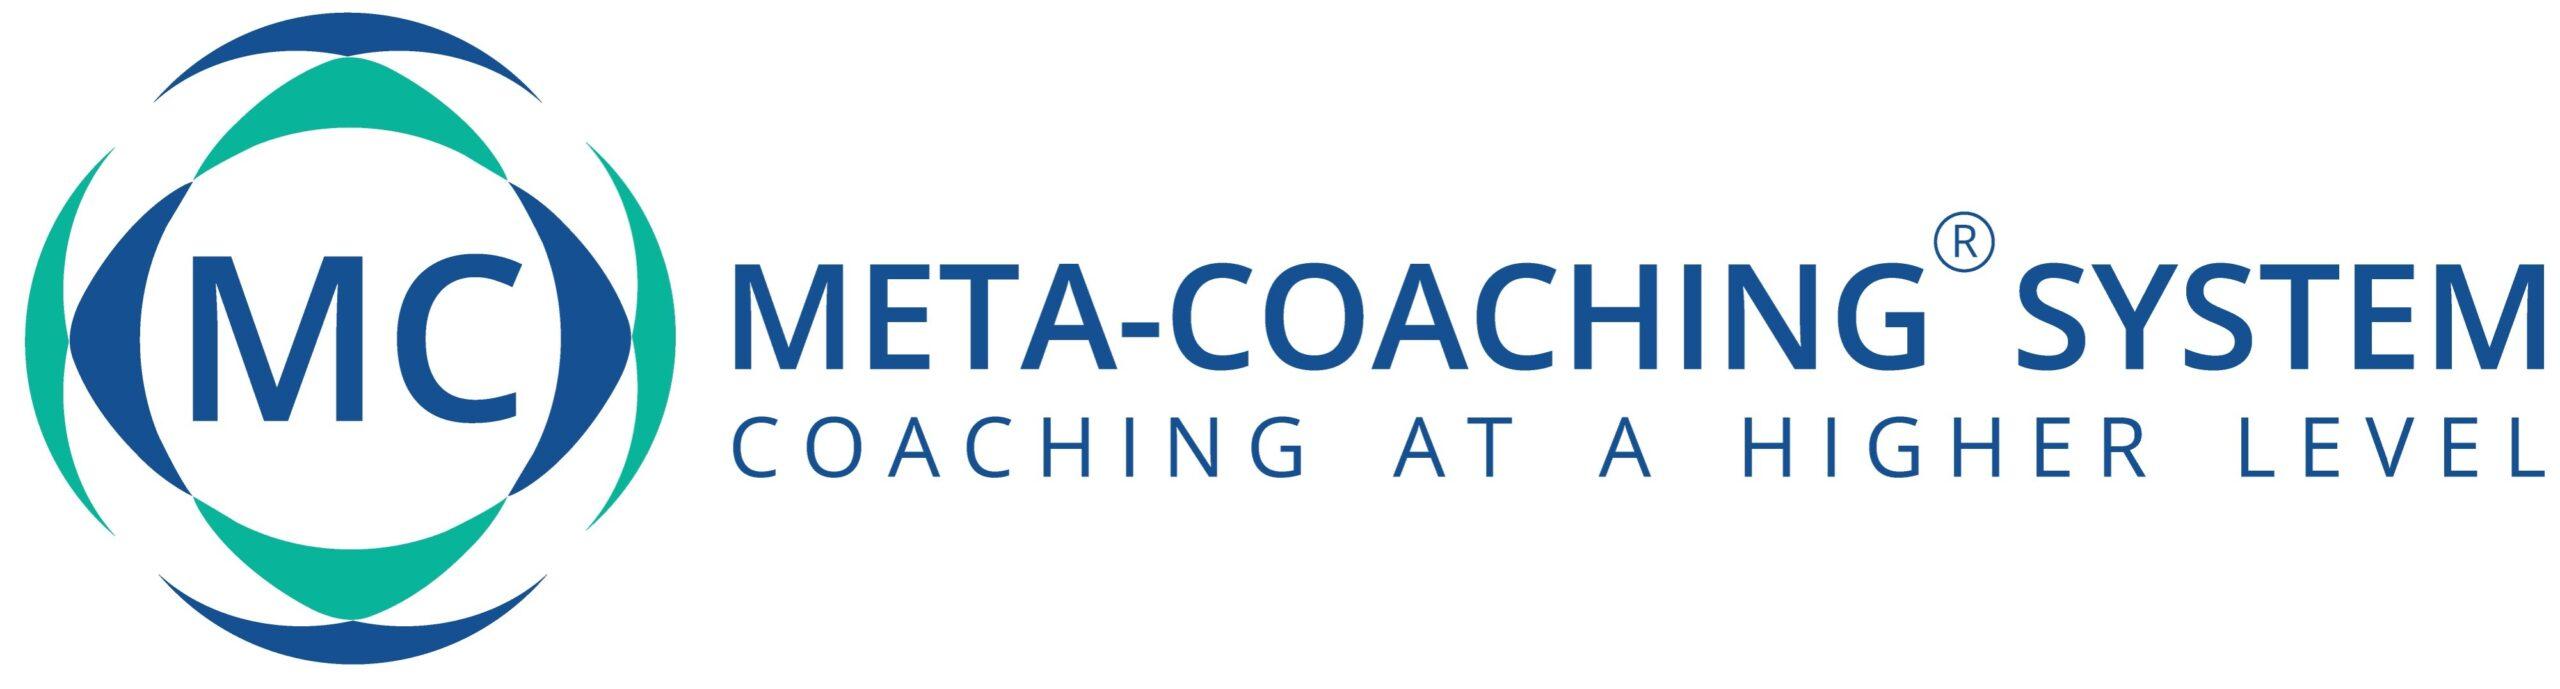 Meta-Coaching Training System Malaysia